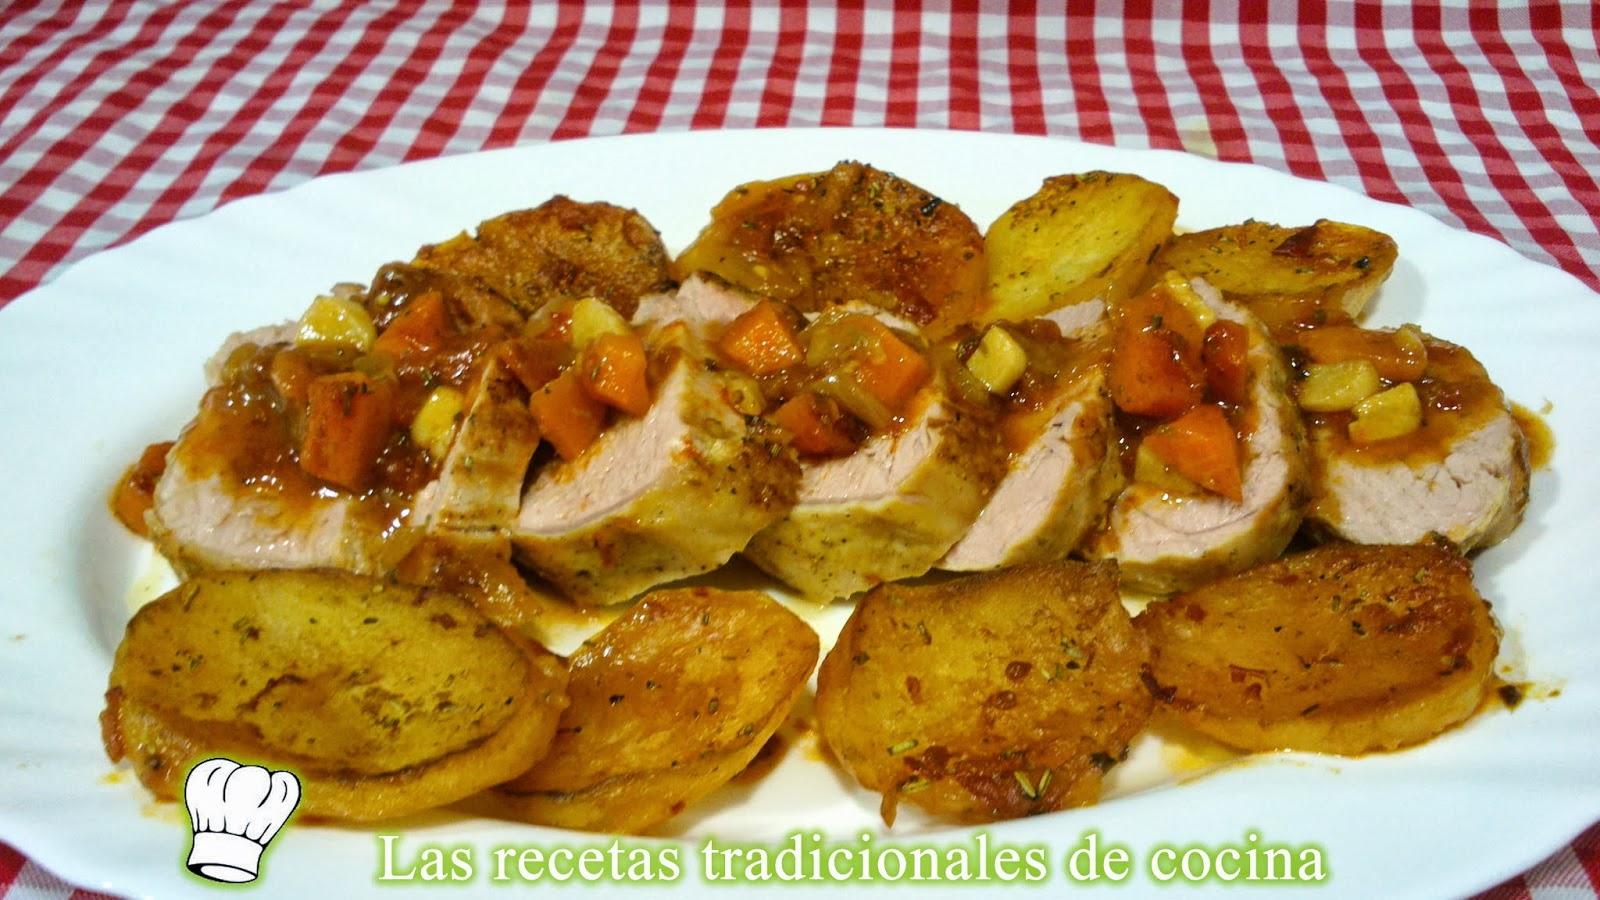 Receta De Solomillo Ib Rico Horno Recetas De Cocina Con: solomillo iberico al horno